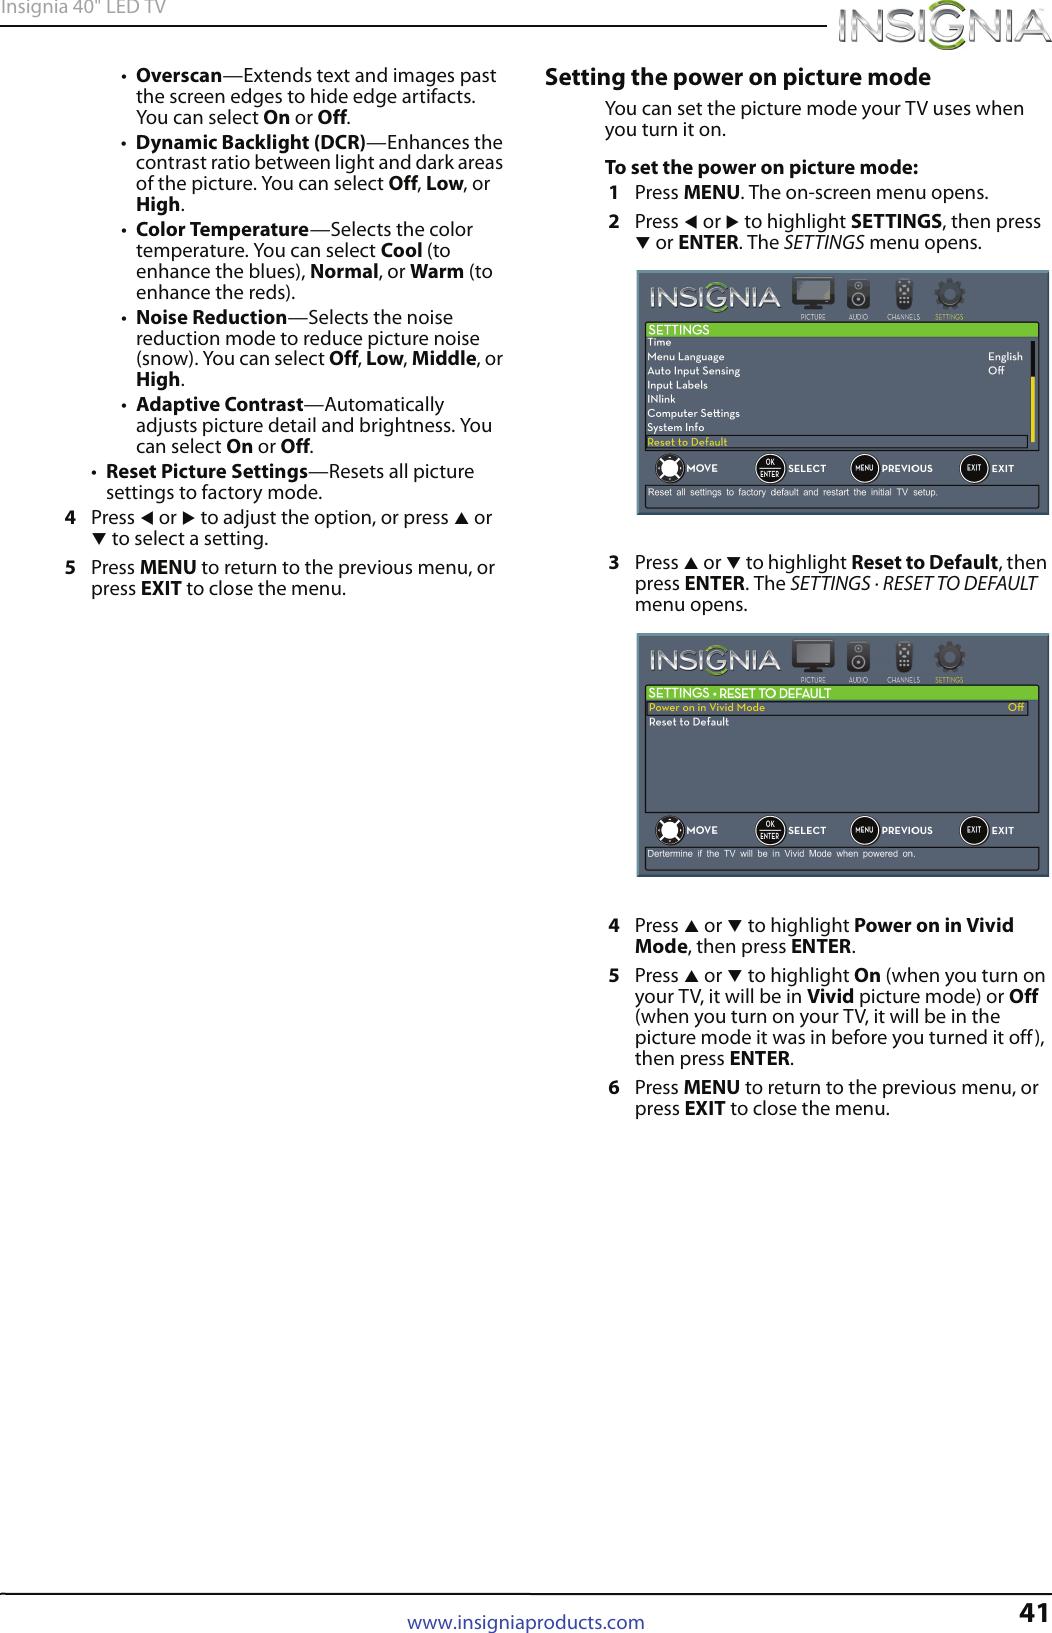 Insignia Ns 40D40Sna14 Owner S Manual 40D40SNA14_13